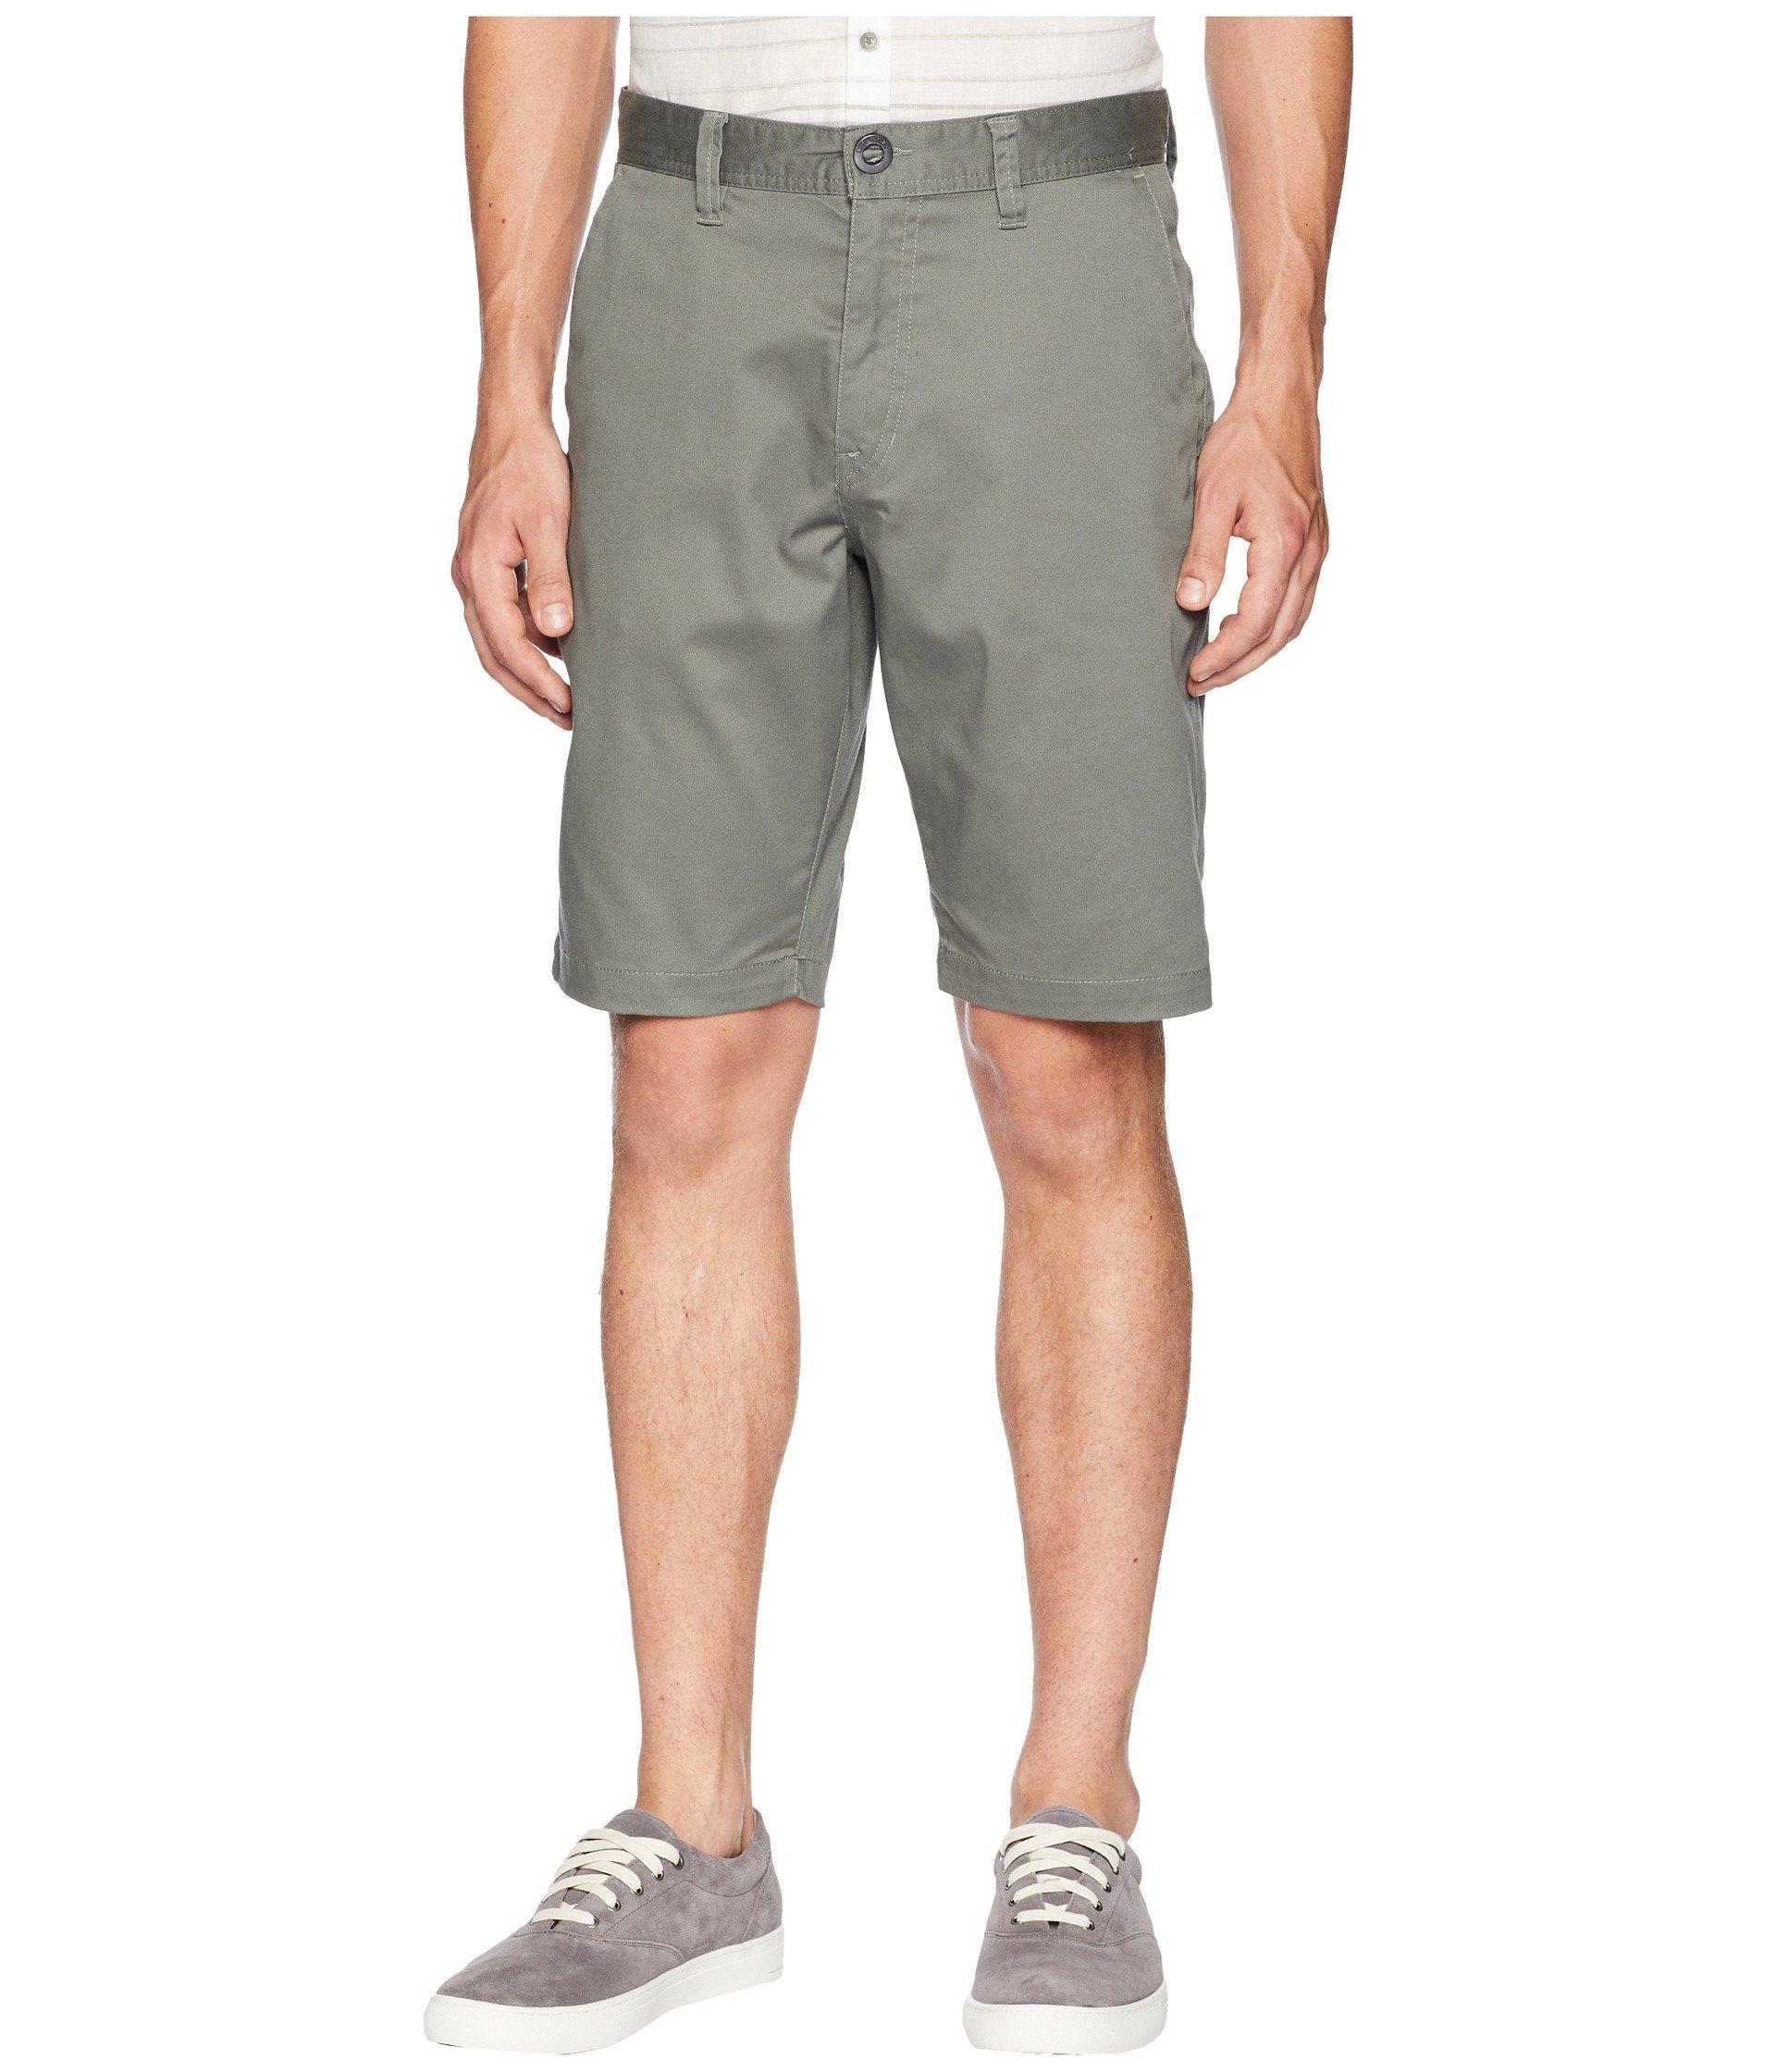 Shorts Stretch Zap Green Frickin Dusty Volcom Mod qZWzv6FBFw